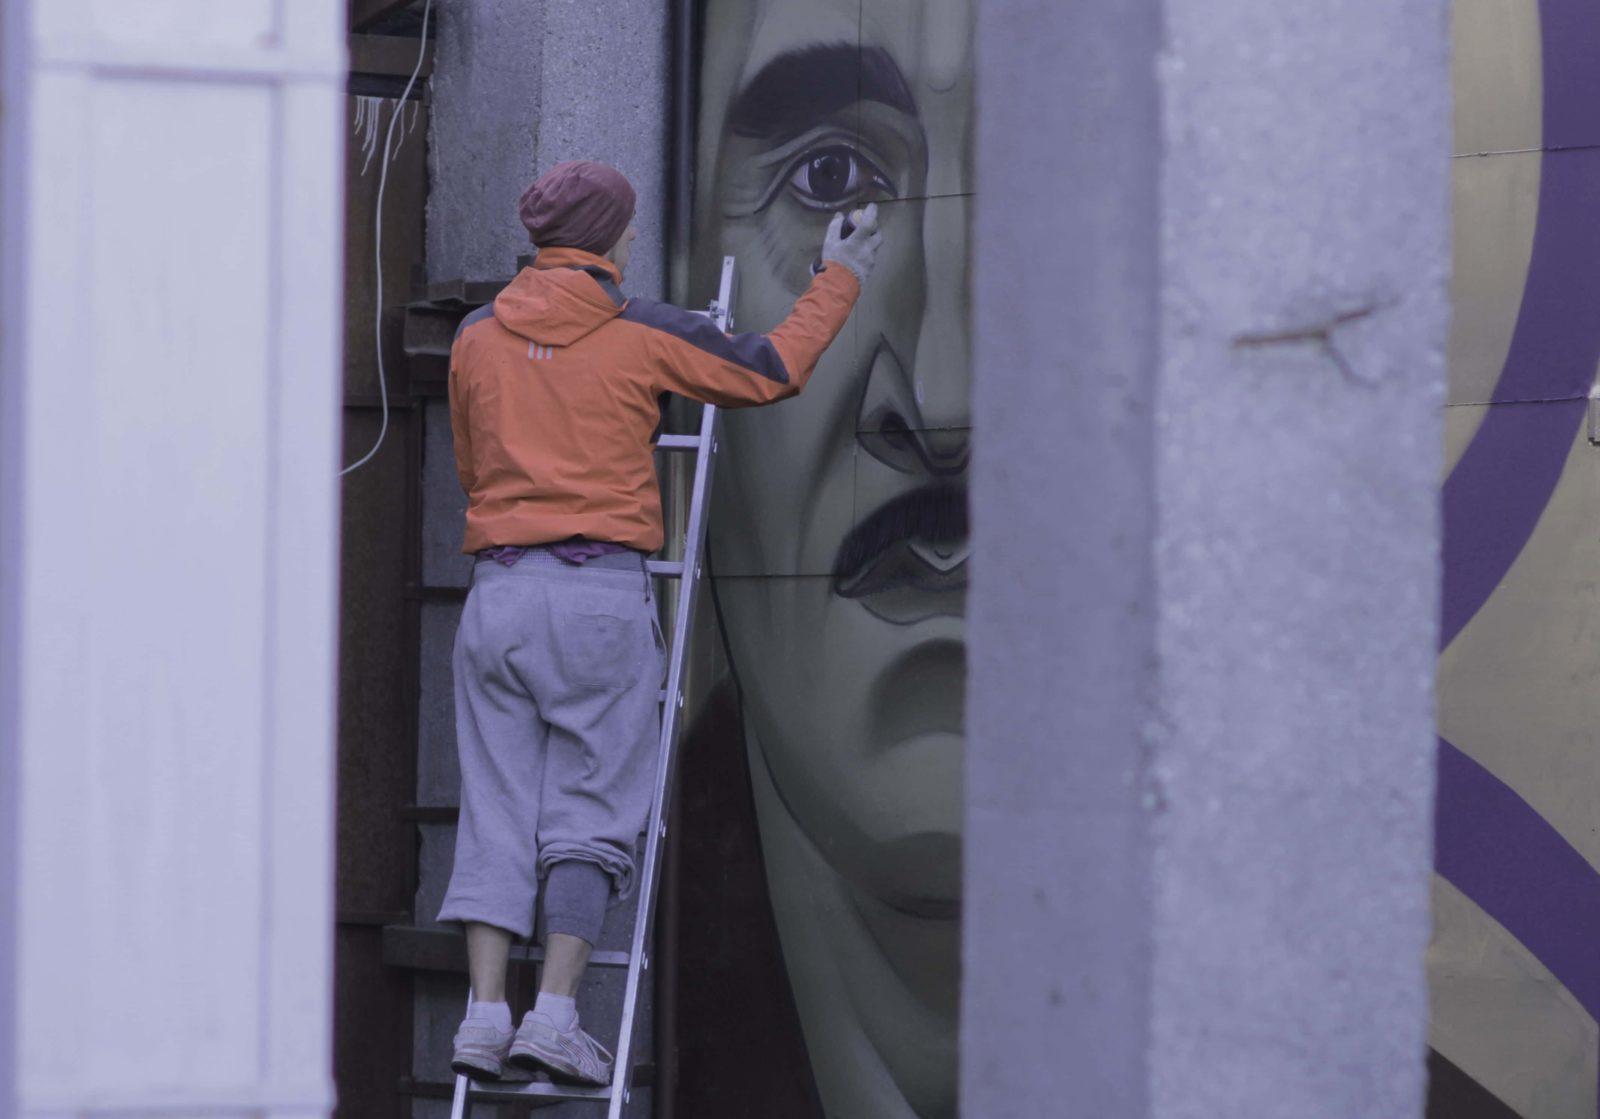 street art museum saint petersburg russie art urbain musee artiste - Street Art Museum, le temple russe des arts urbains